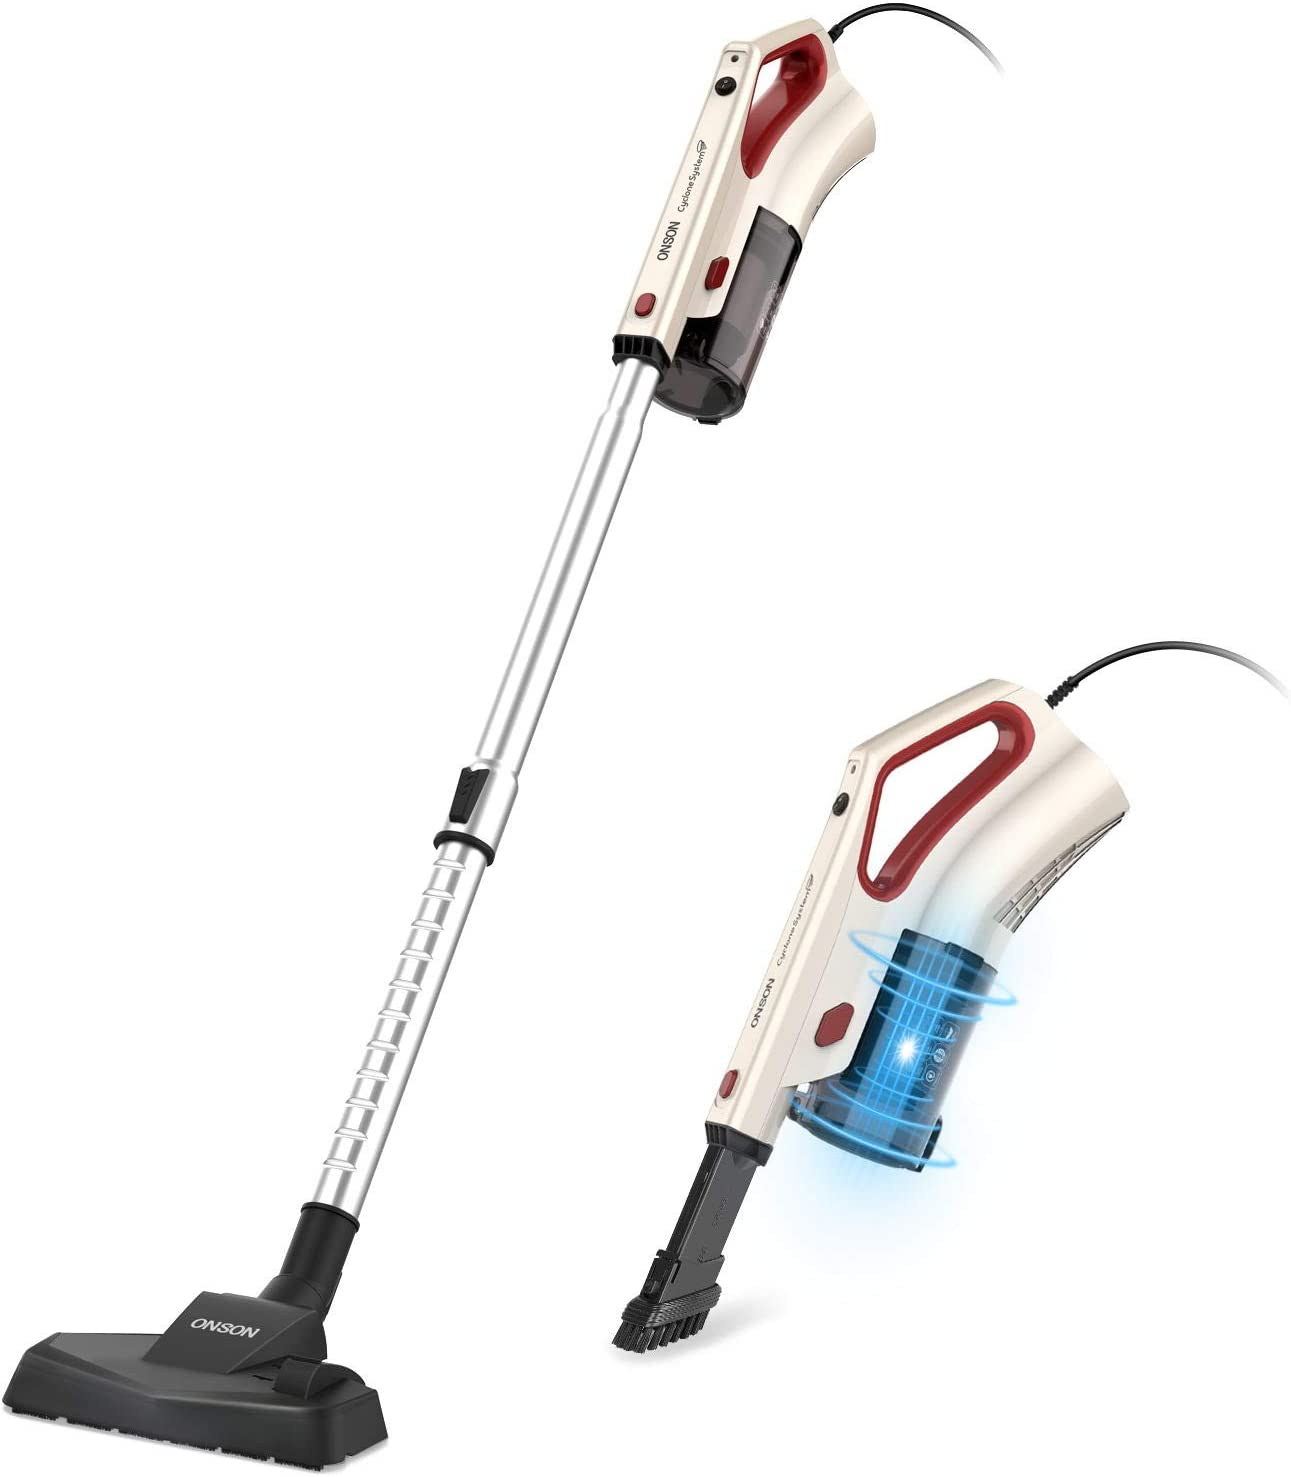 ONSON Vacuum Cleaner Corded, 16KPa Powerful Suction Stick Vacuum, 2 in 1 Handheld Vacuum Lightweight for Hardwood Floor